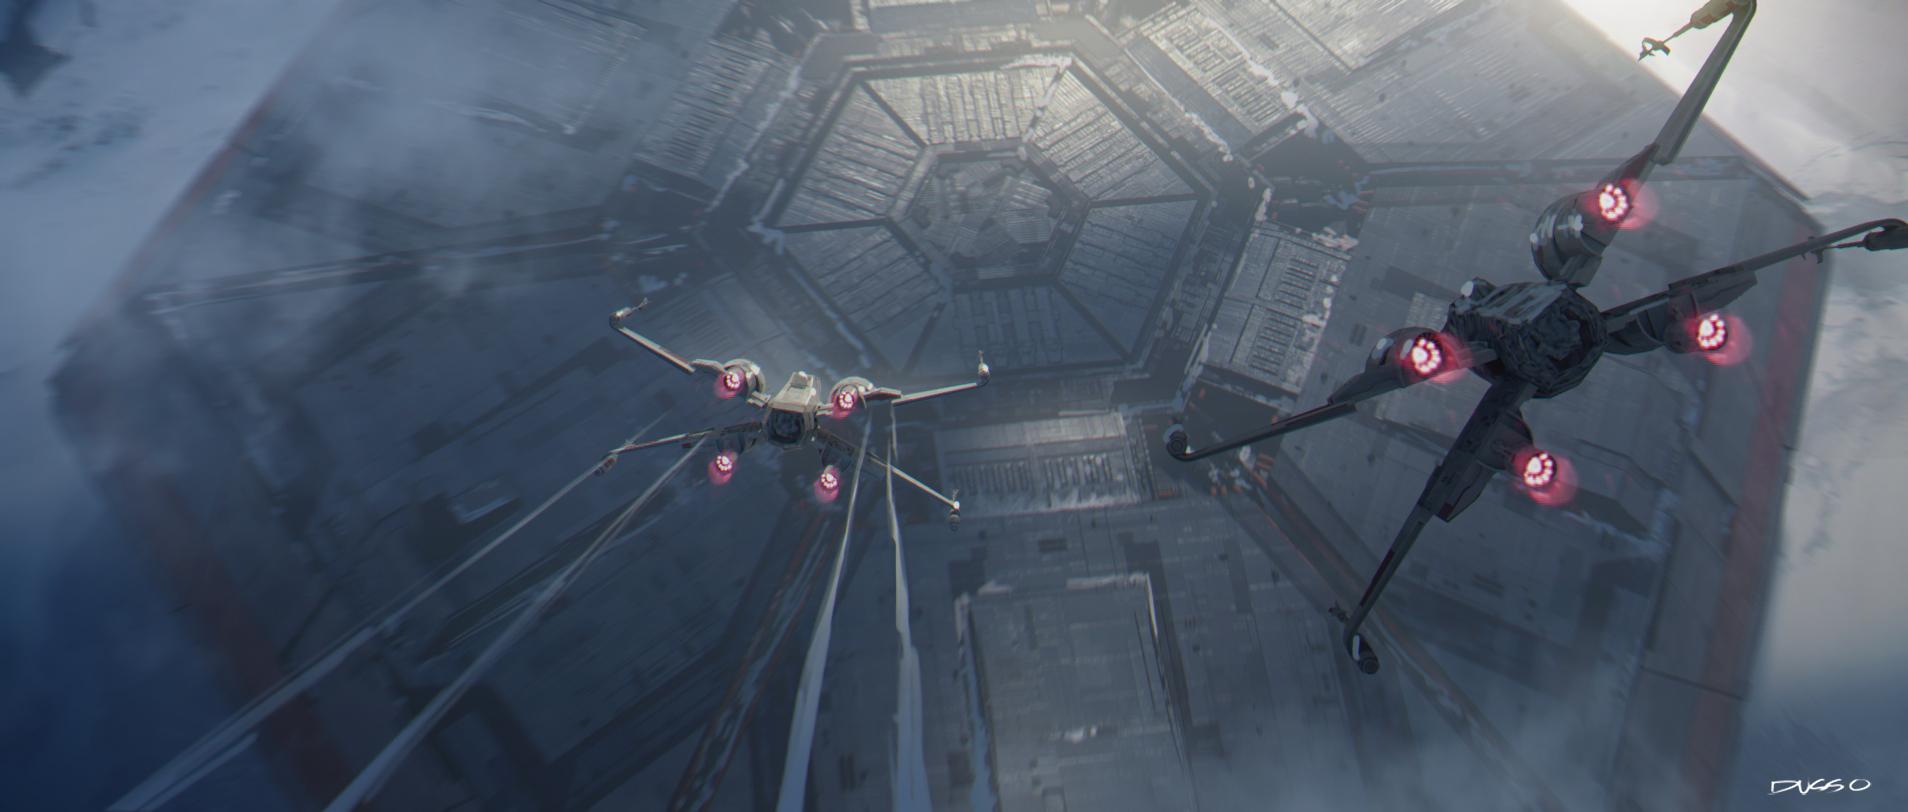 concept-art-dusseault-star-wars-tie-fighter